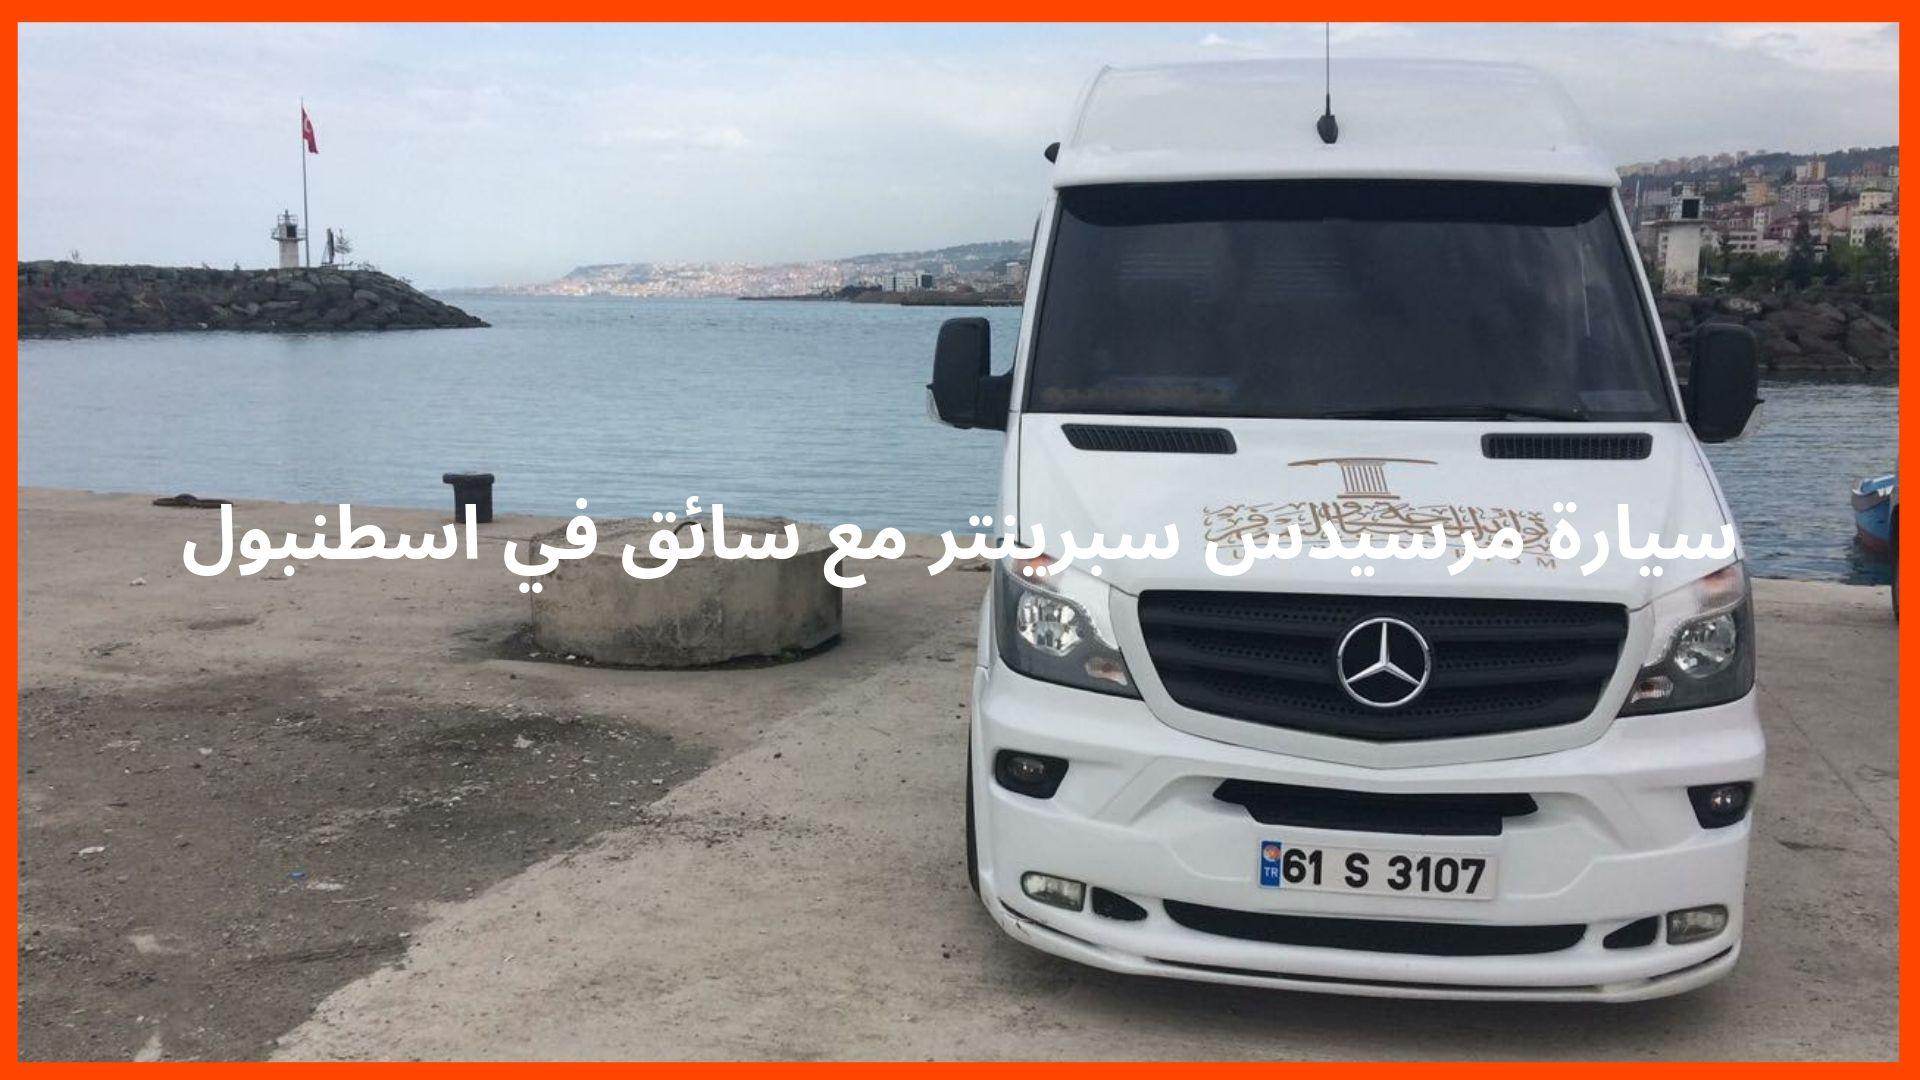 سيارة مرسيدس سبرينتر مع سائق في اسطنبول